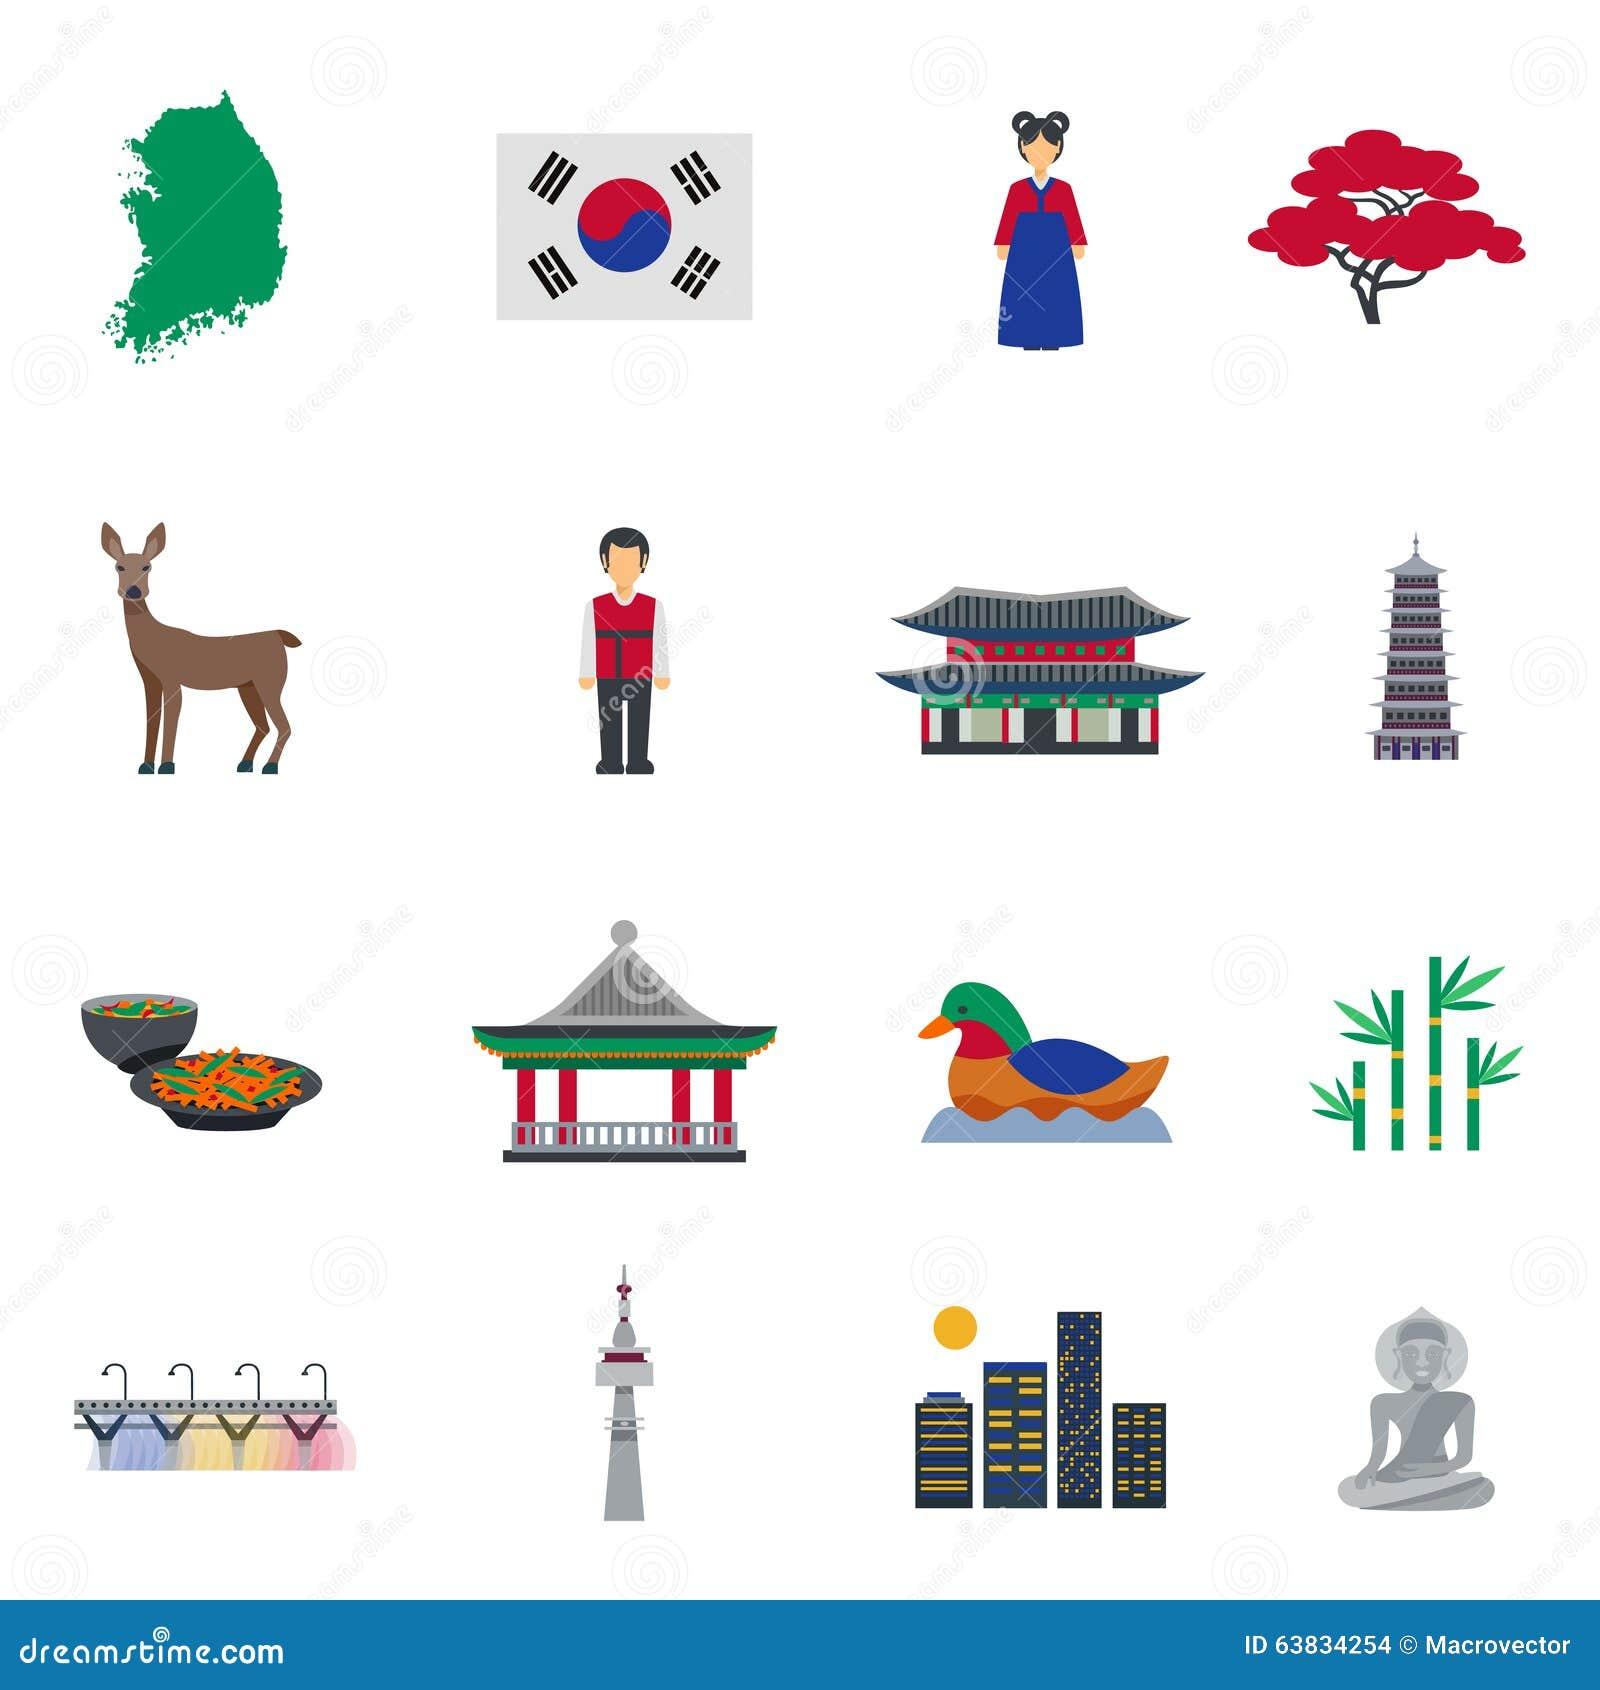 korean clipart - photo #42